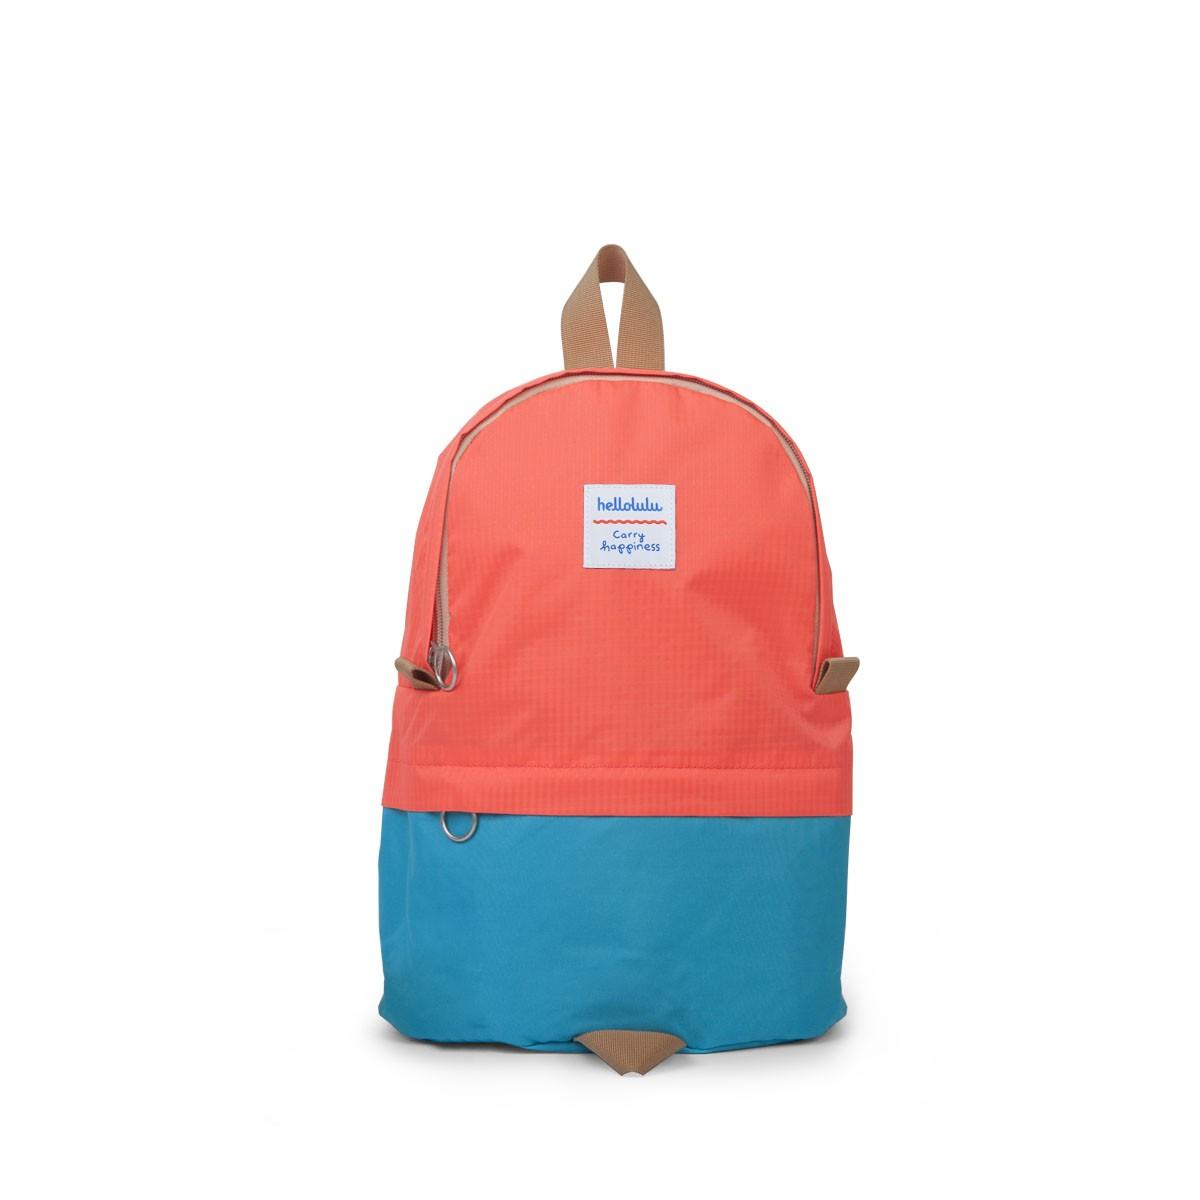 Hellolulu กระเป๋าเด็ก รุ่น PILI - Neon Orange/Light Blue